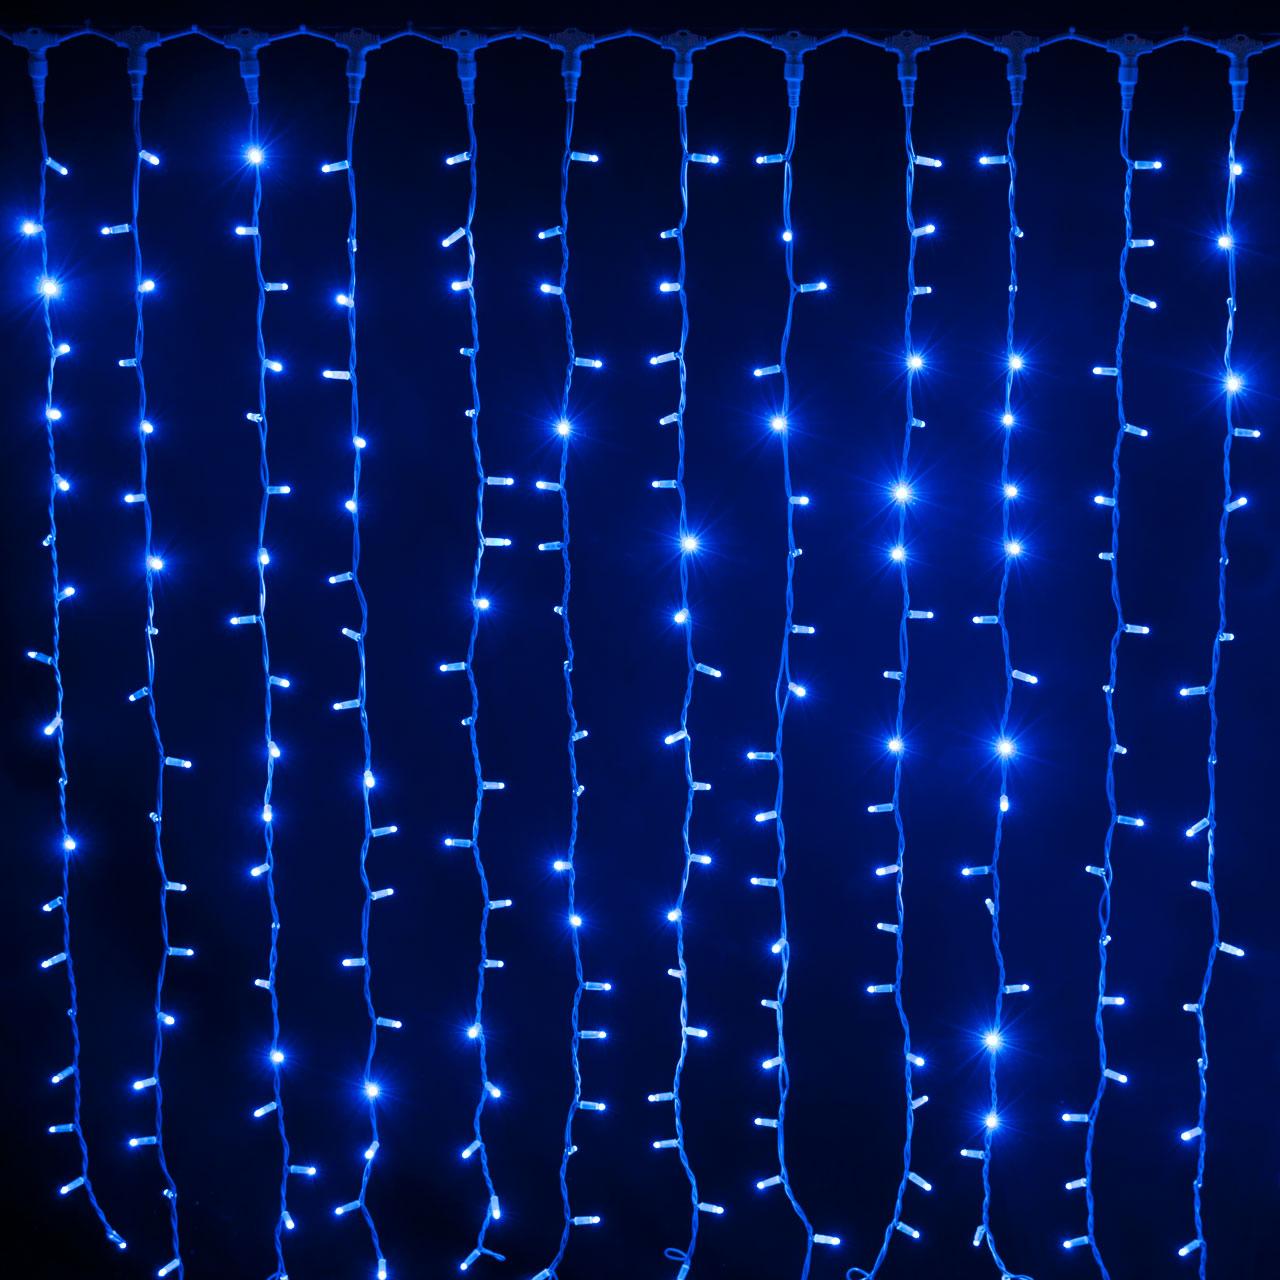 Tende Luminose Da Esterno.Noleggio Luci Tenda Luminosa A Led Blu 2 X 1 2 Mt A Milano